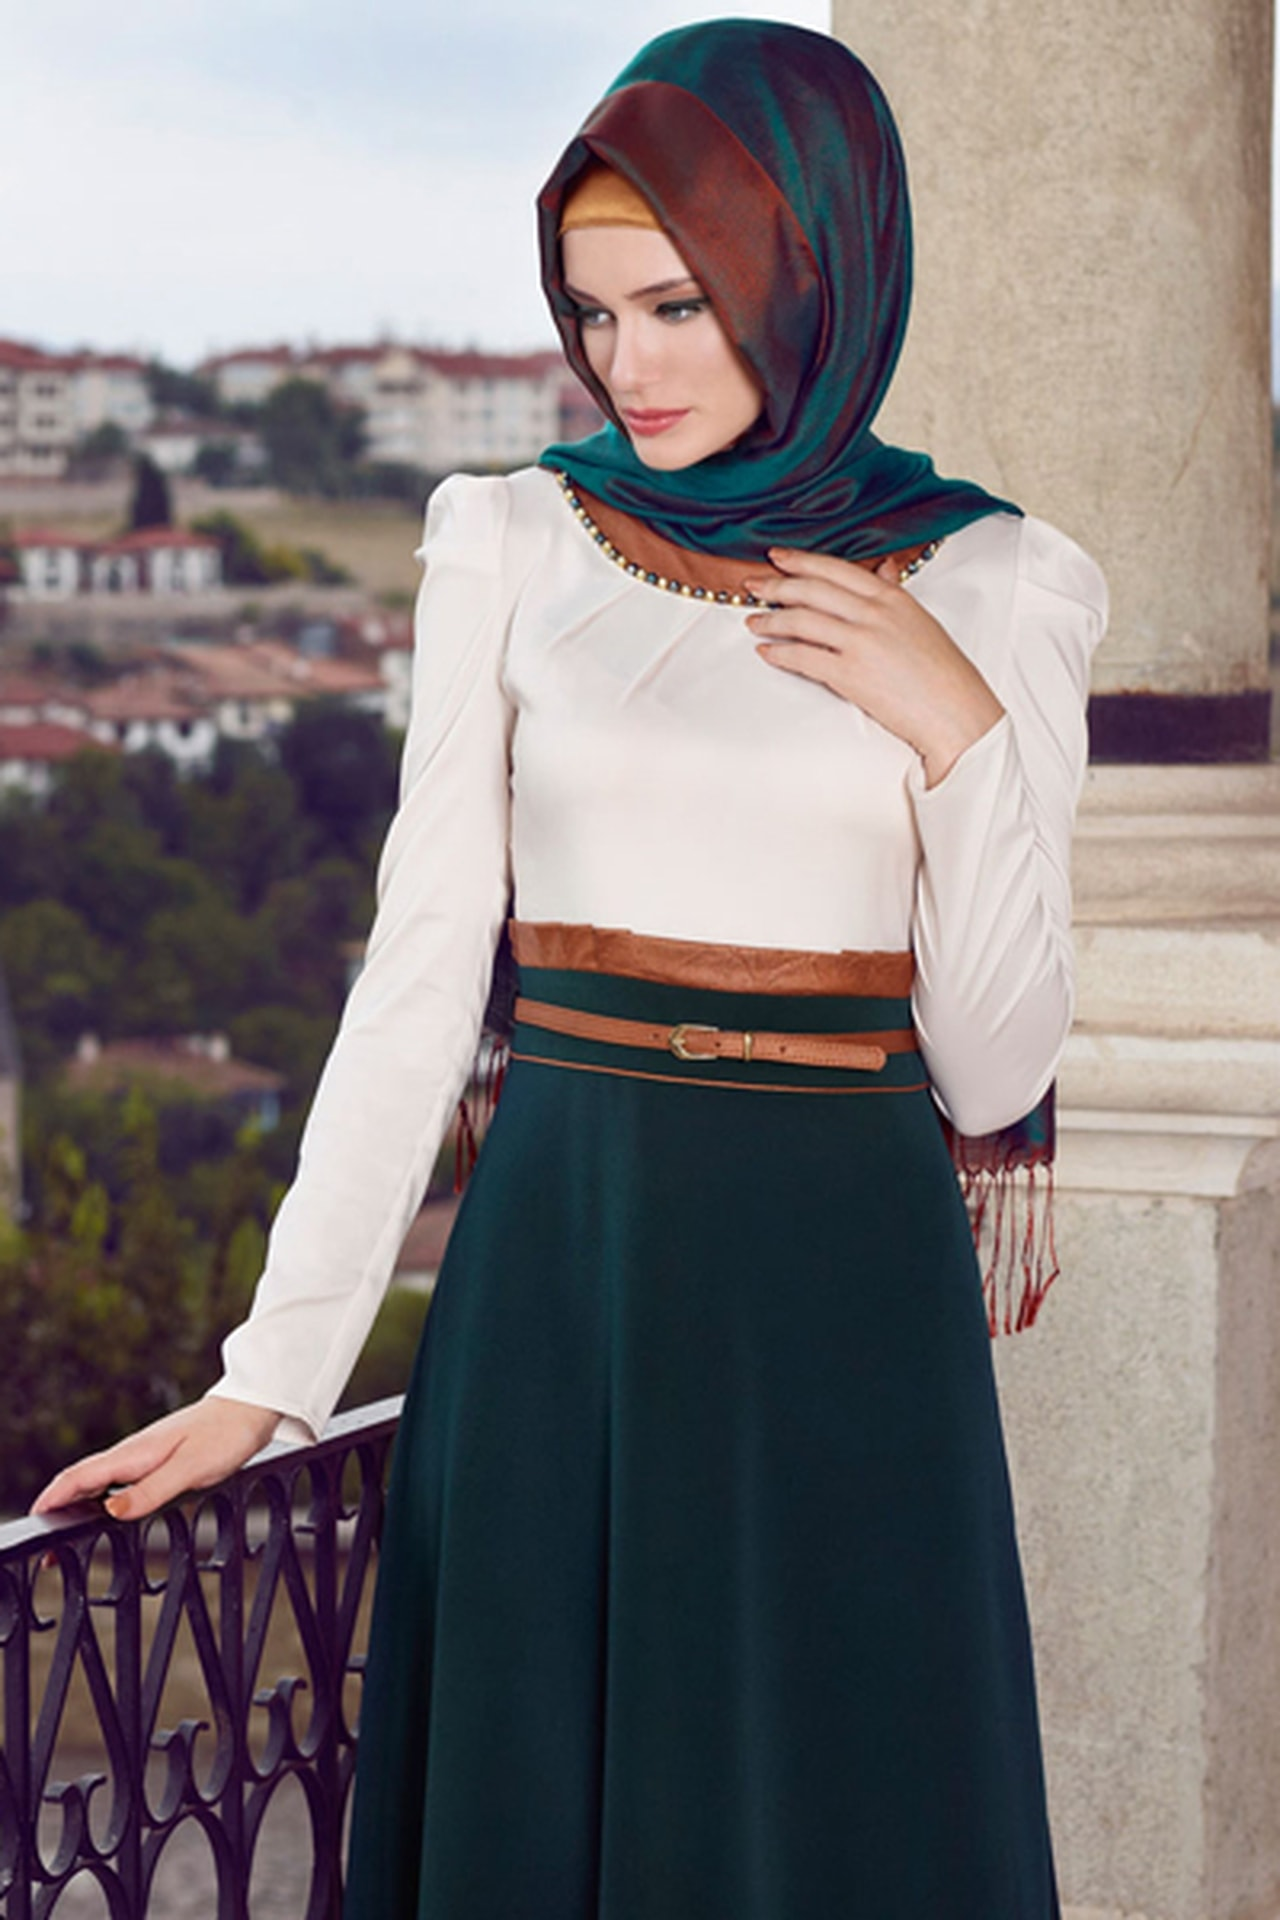 بالصور موديلات حجابات تركية , اجمل صور للحجاب التركي 2628 8